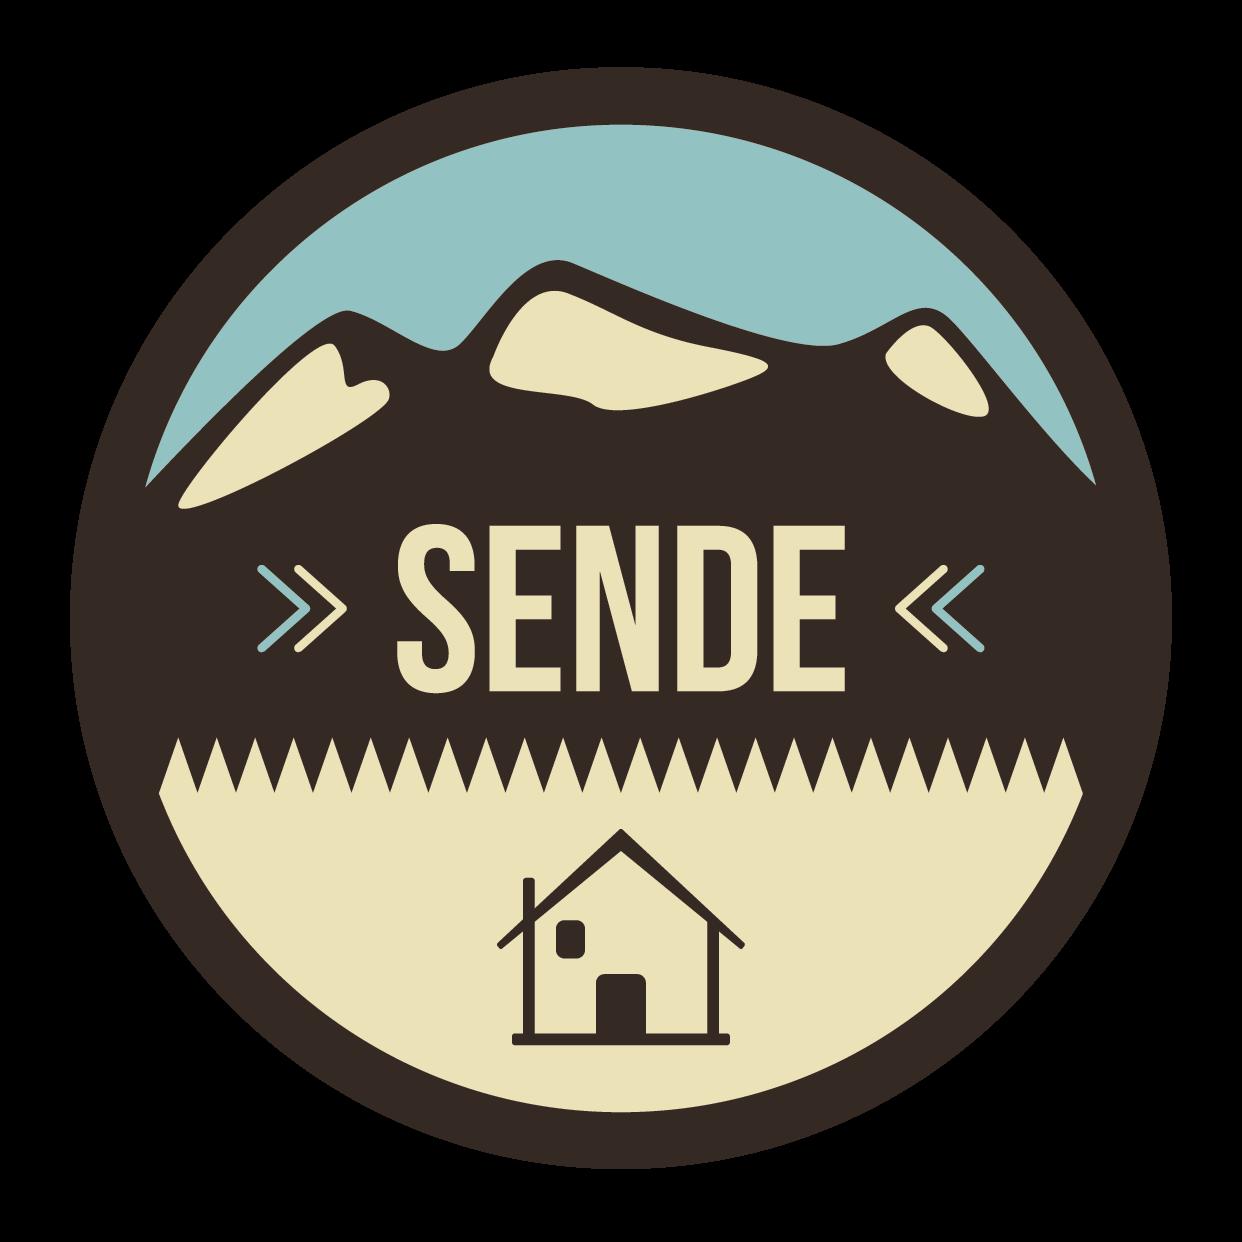 Logo Sende